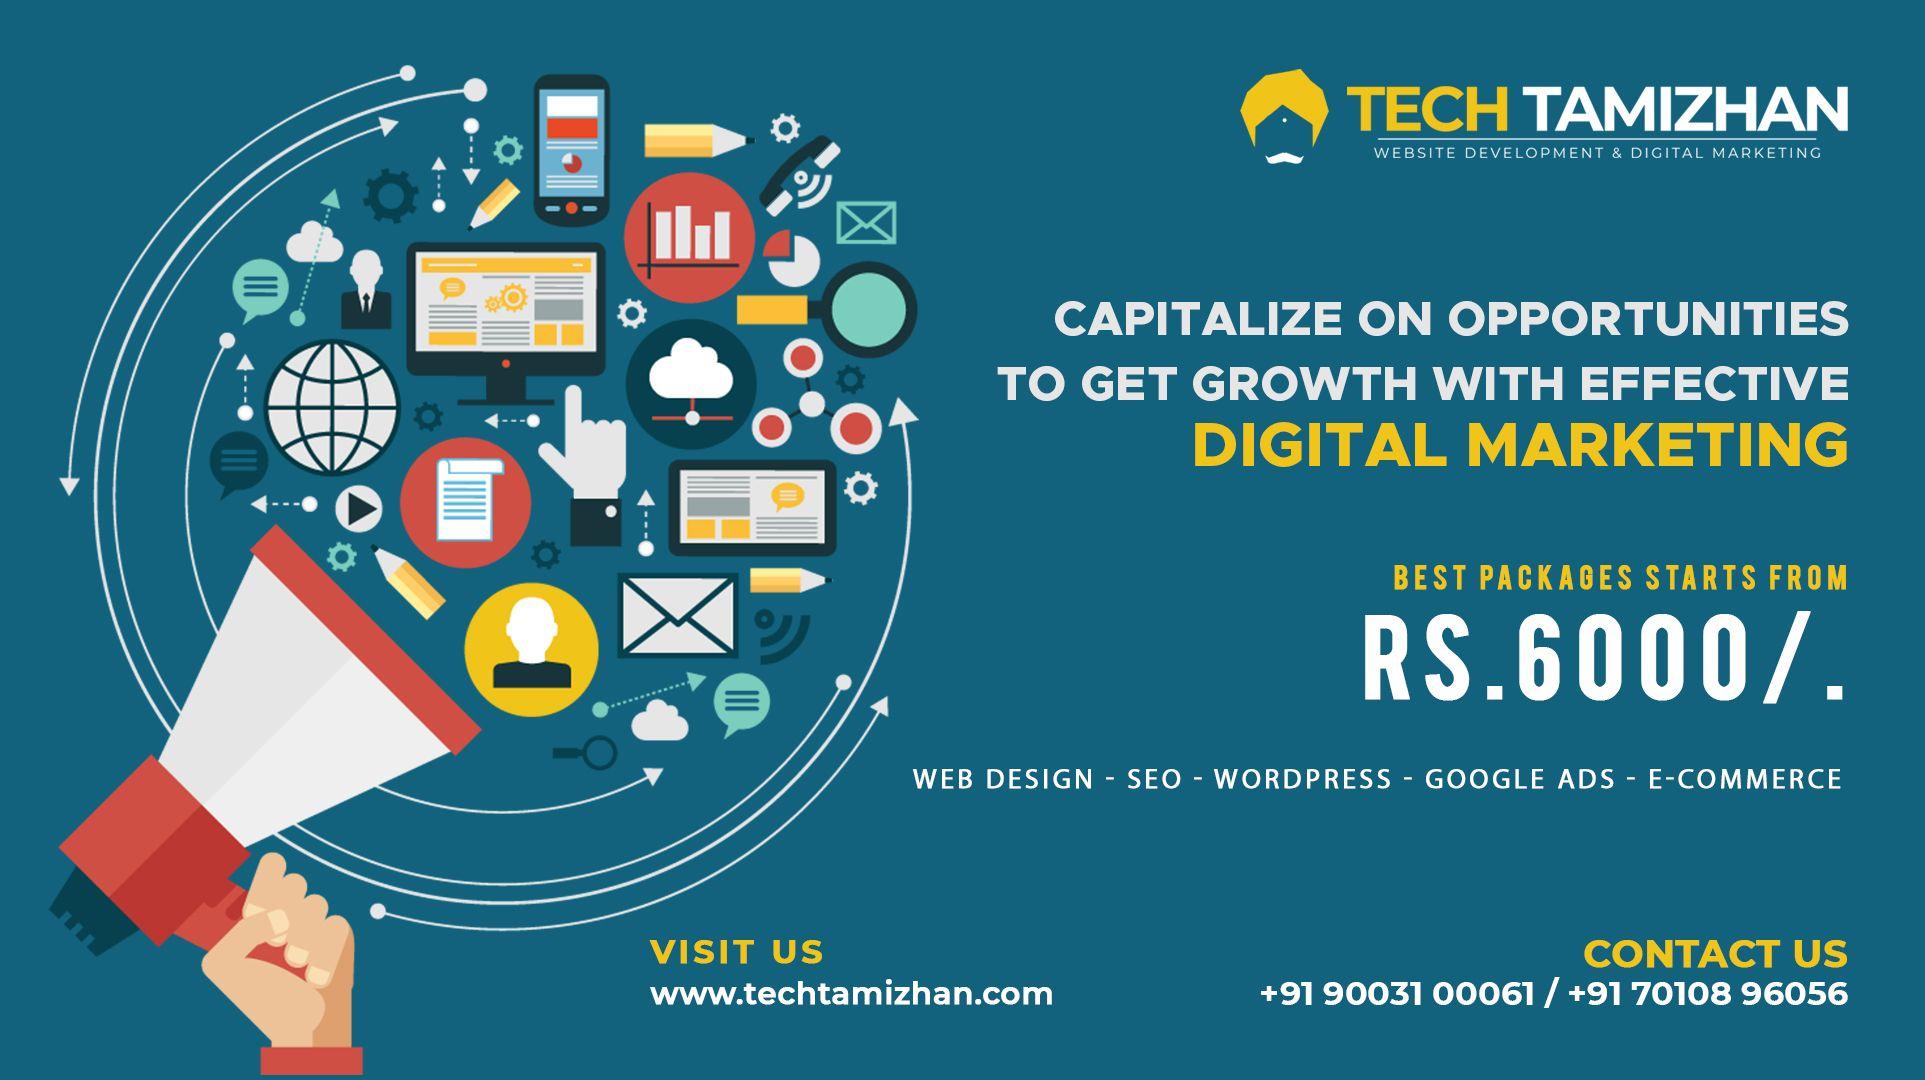 Tech Tamizhan Digital Marketing Contact Us 91 90031 00061 Visit Us Http Techtamizhan Com In 2020 Website Design Services Digital Marketing Web Design Agency